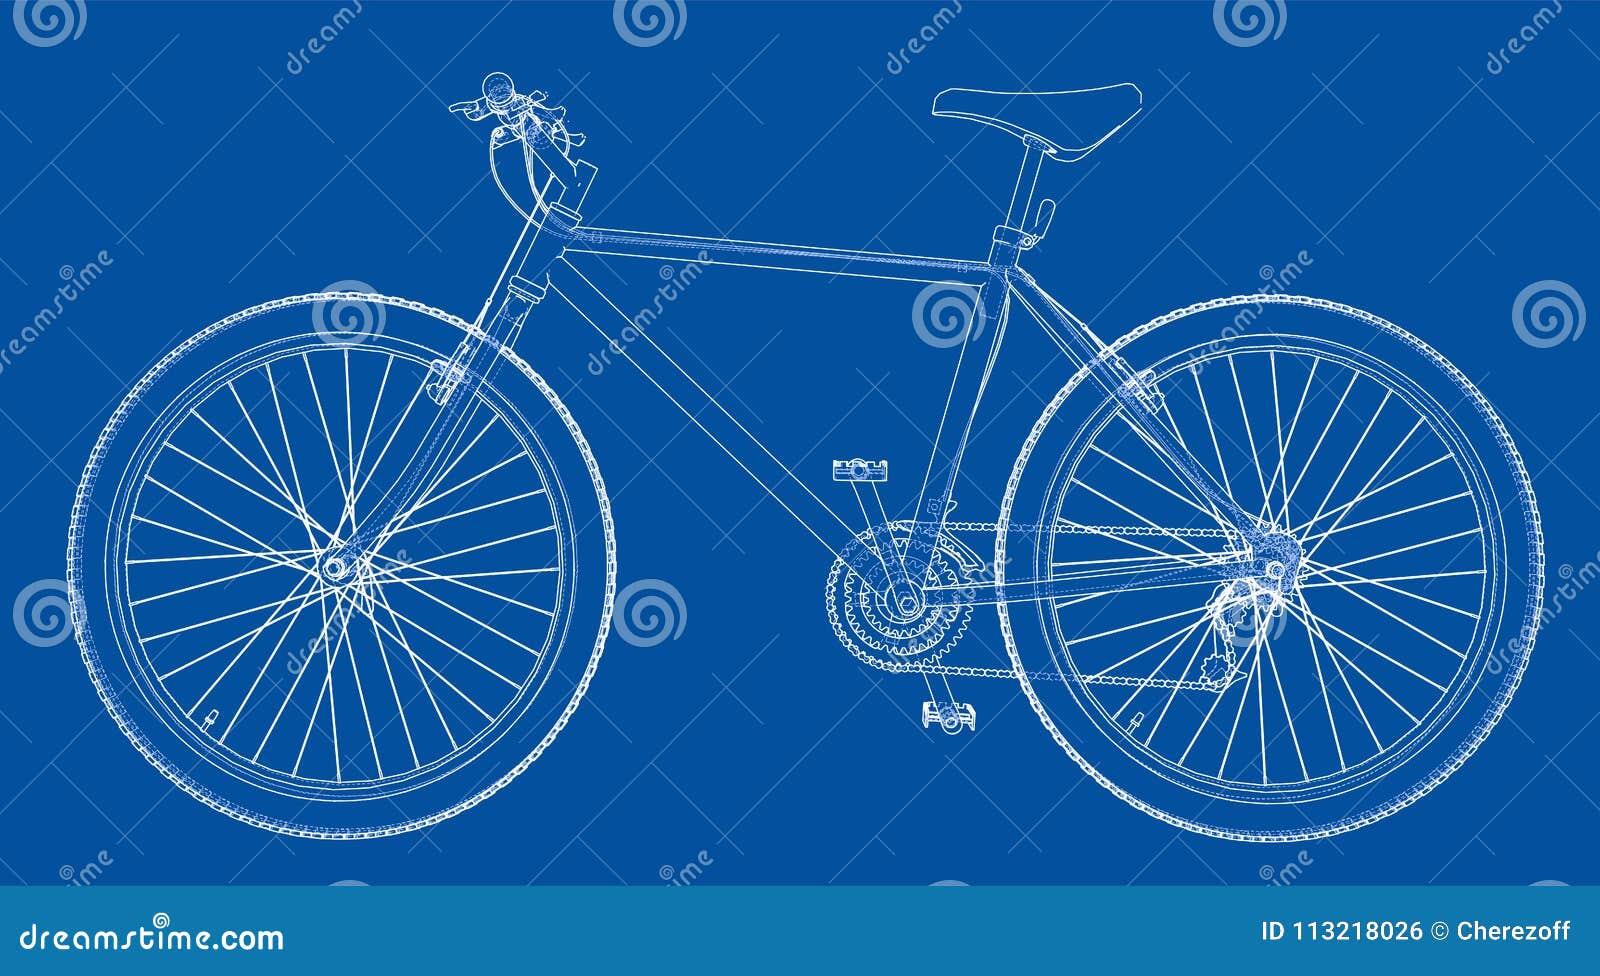 Bicycle Blueprint 3d Illustration Stock Illustration - Illustration ...